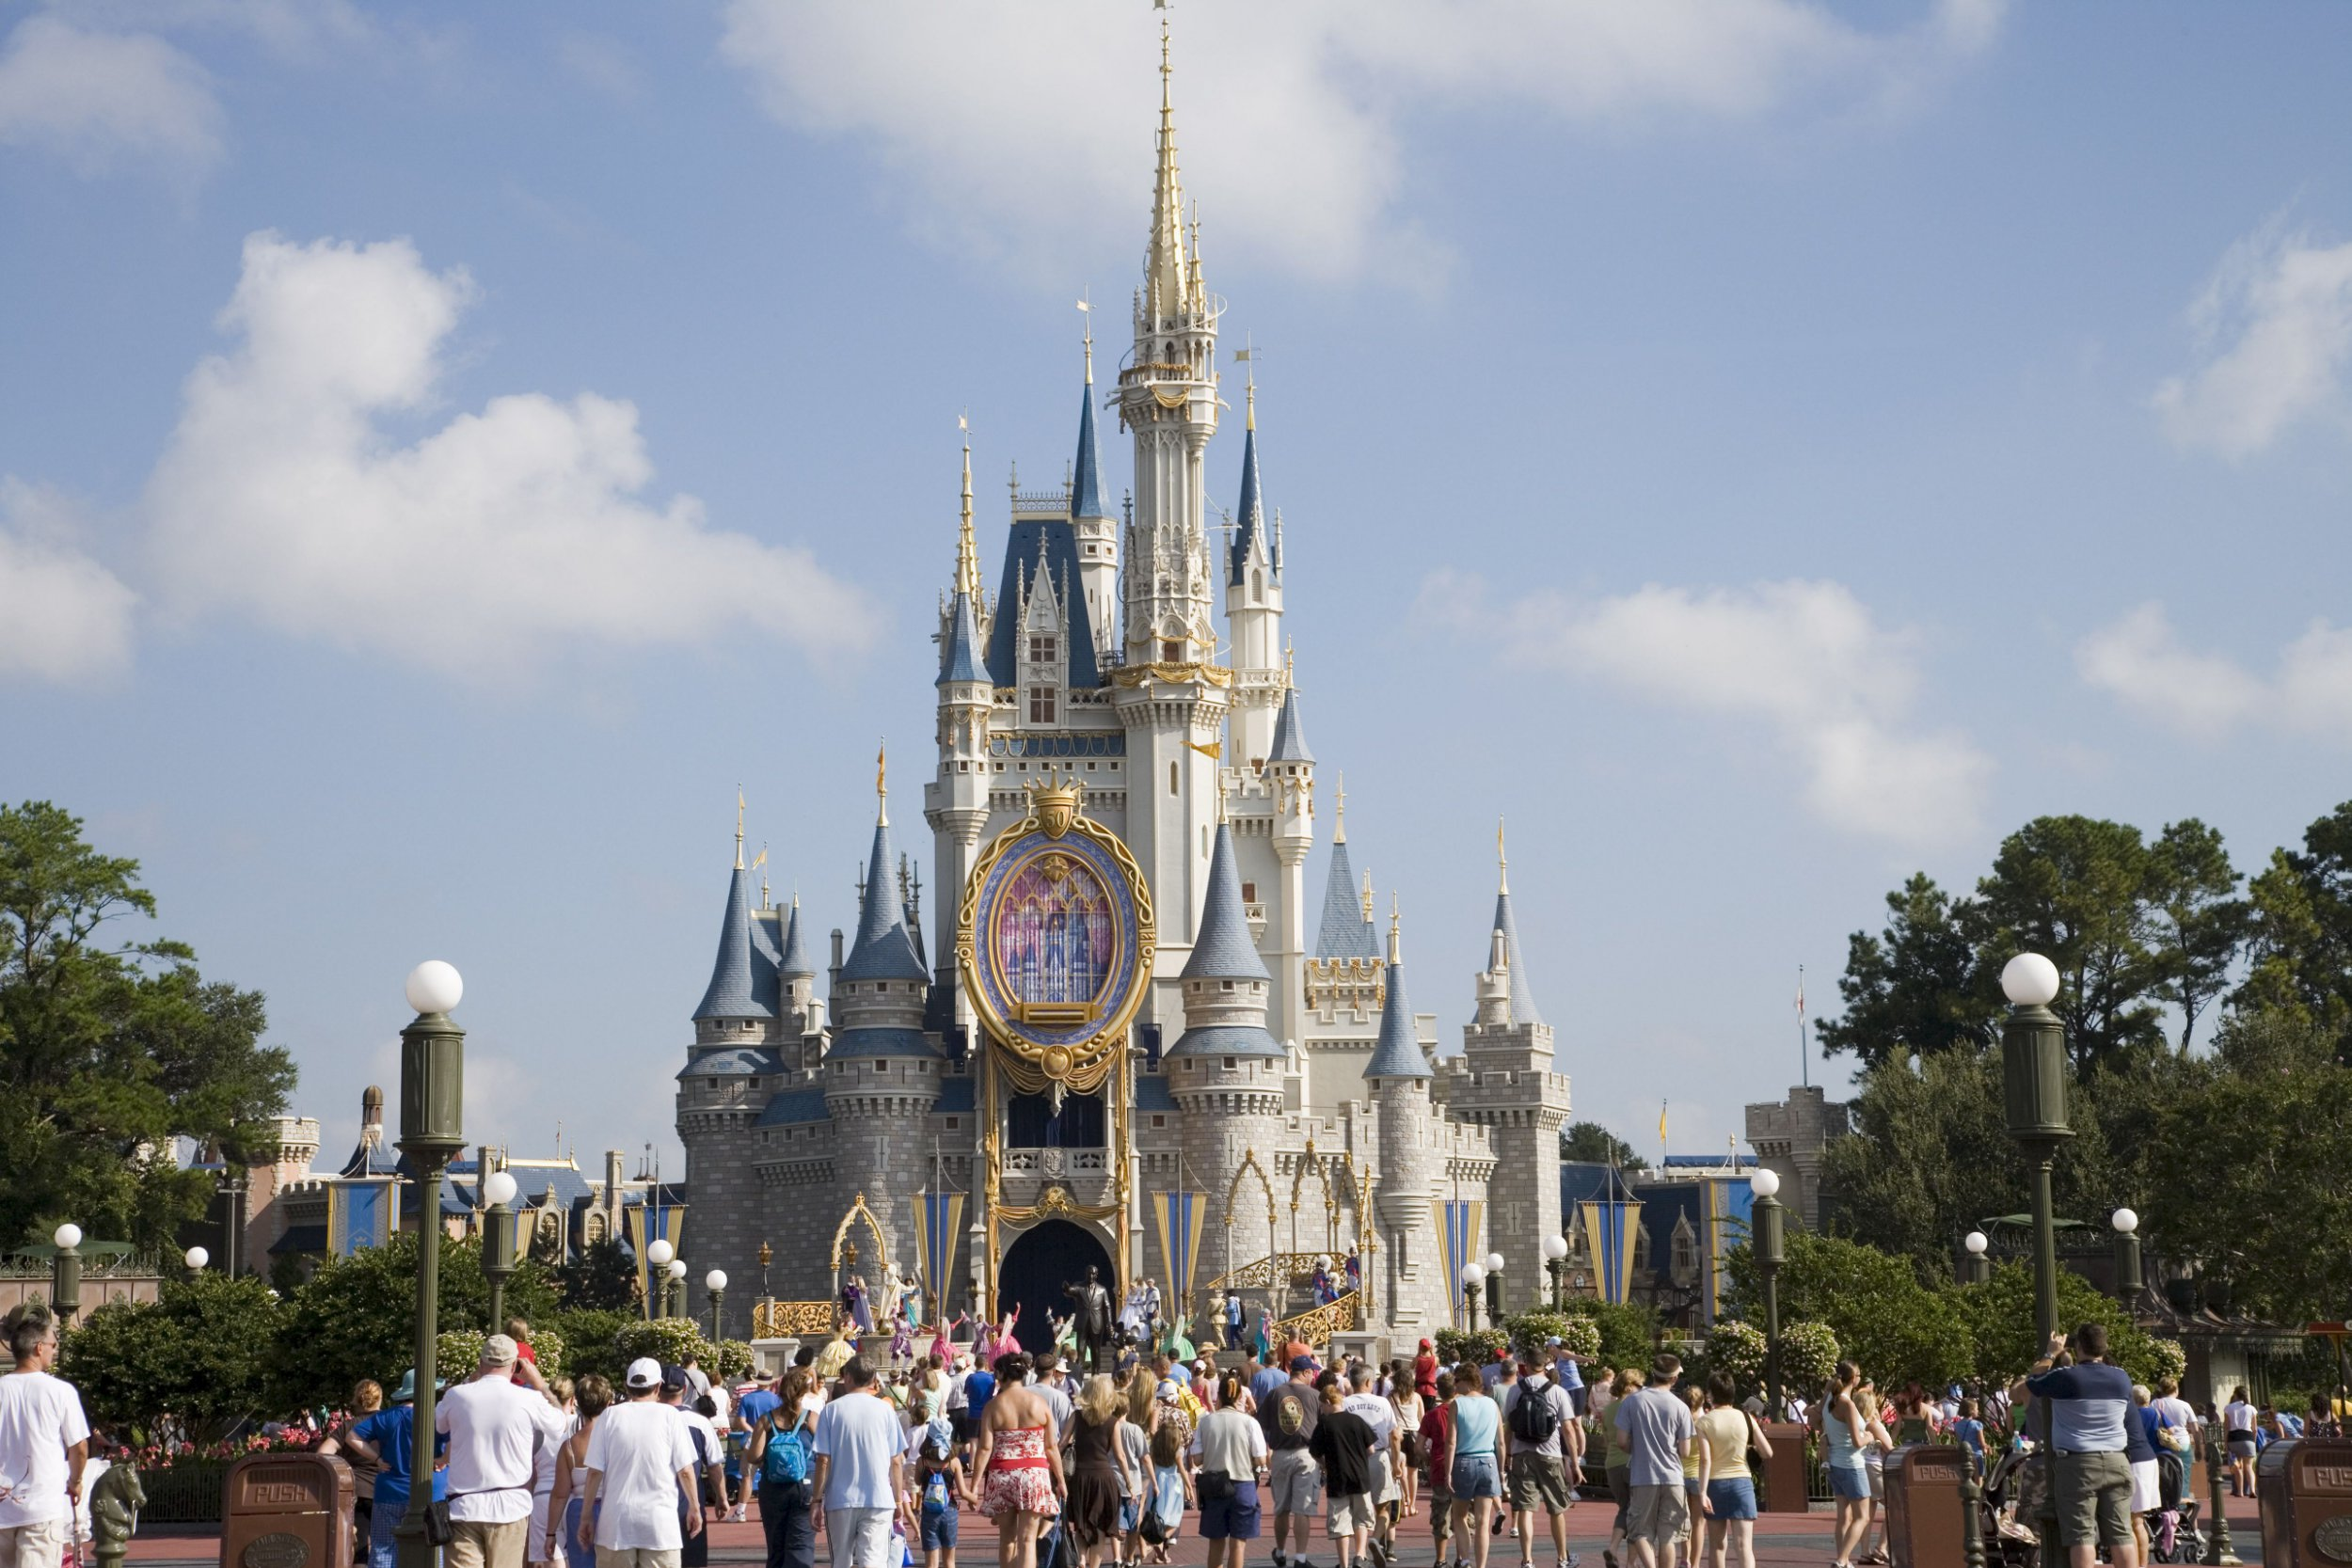 Walt Disney World will be hosting its own Disney water park parties